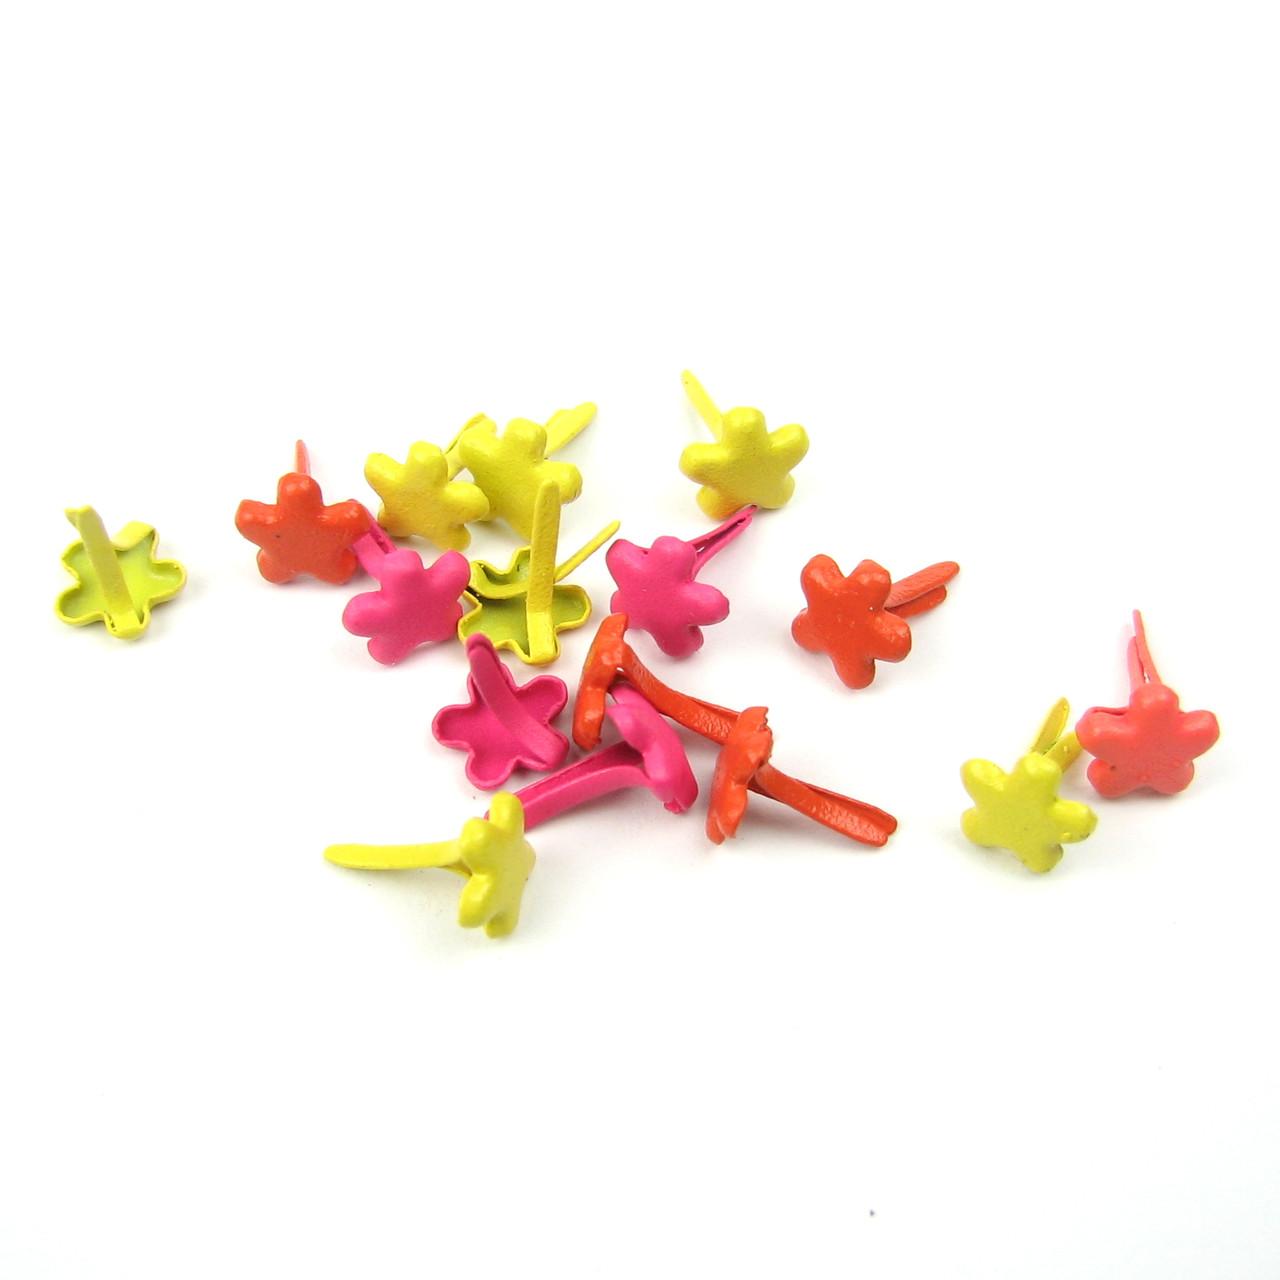 Брадсы цветочки для рукоделия 6мм микс 10шт в наборе